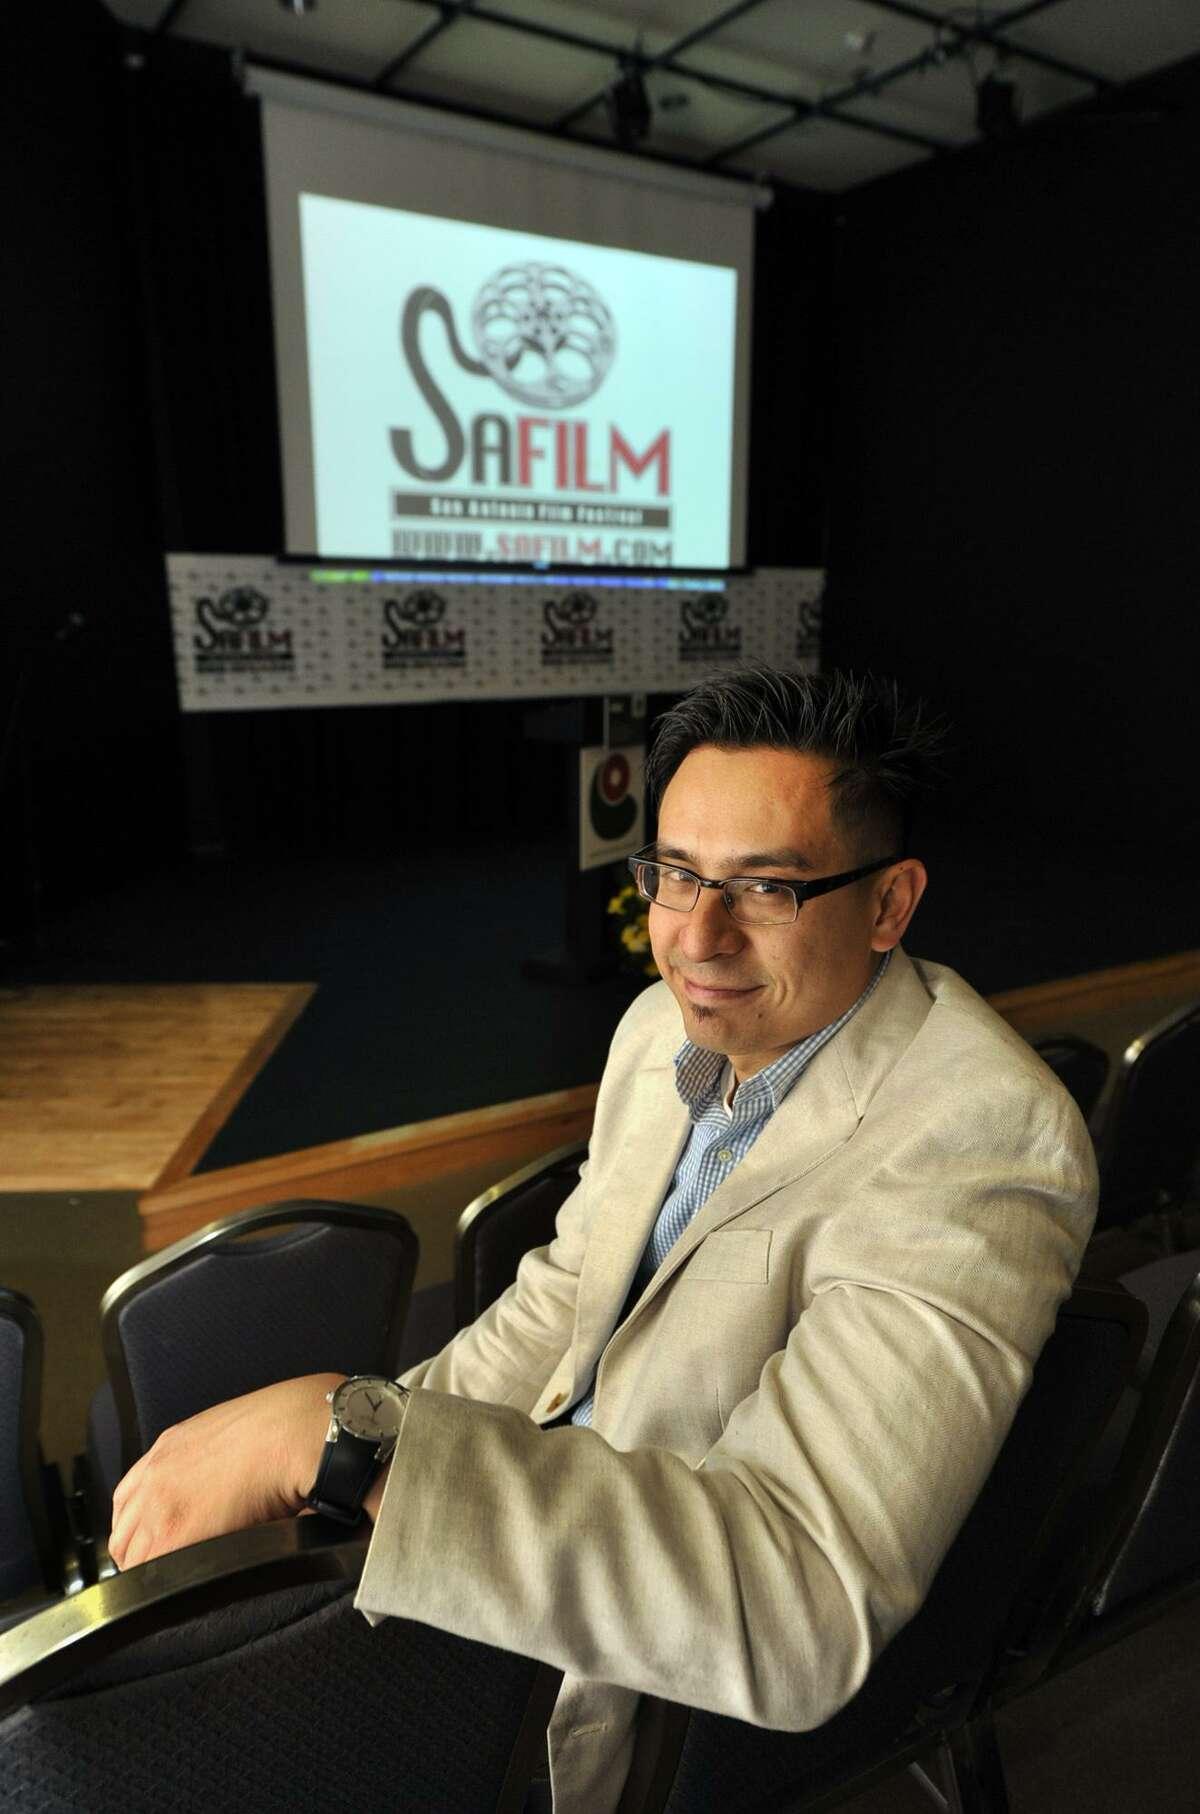 The SA Film Festival's Founder and Executive Director Adam Rocha.